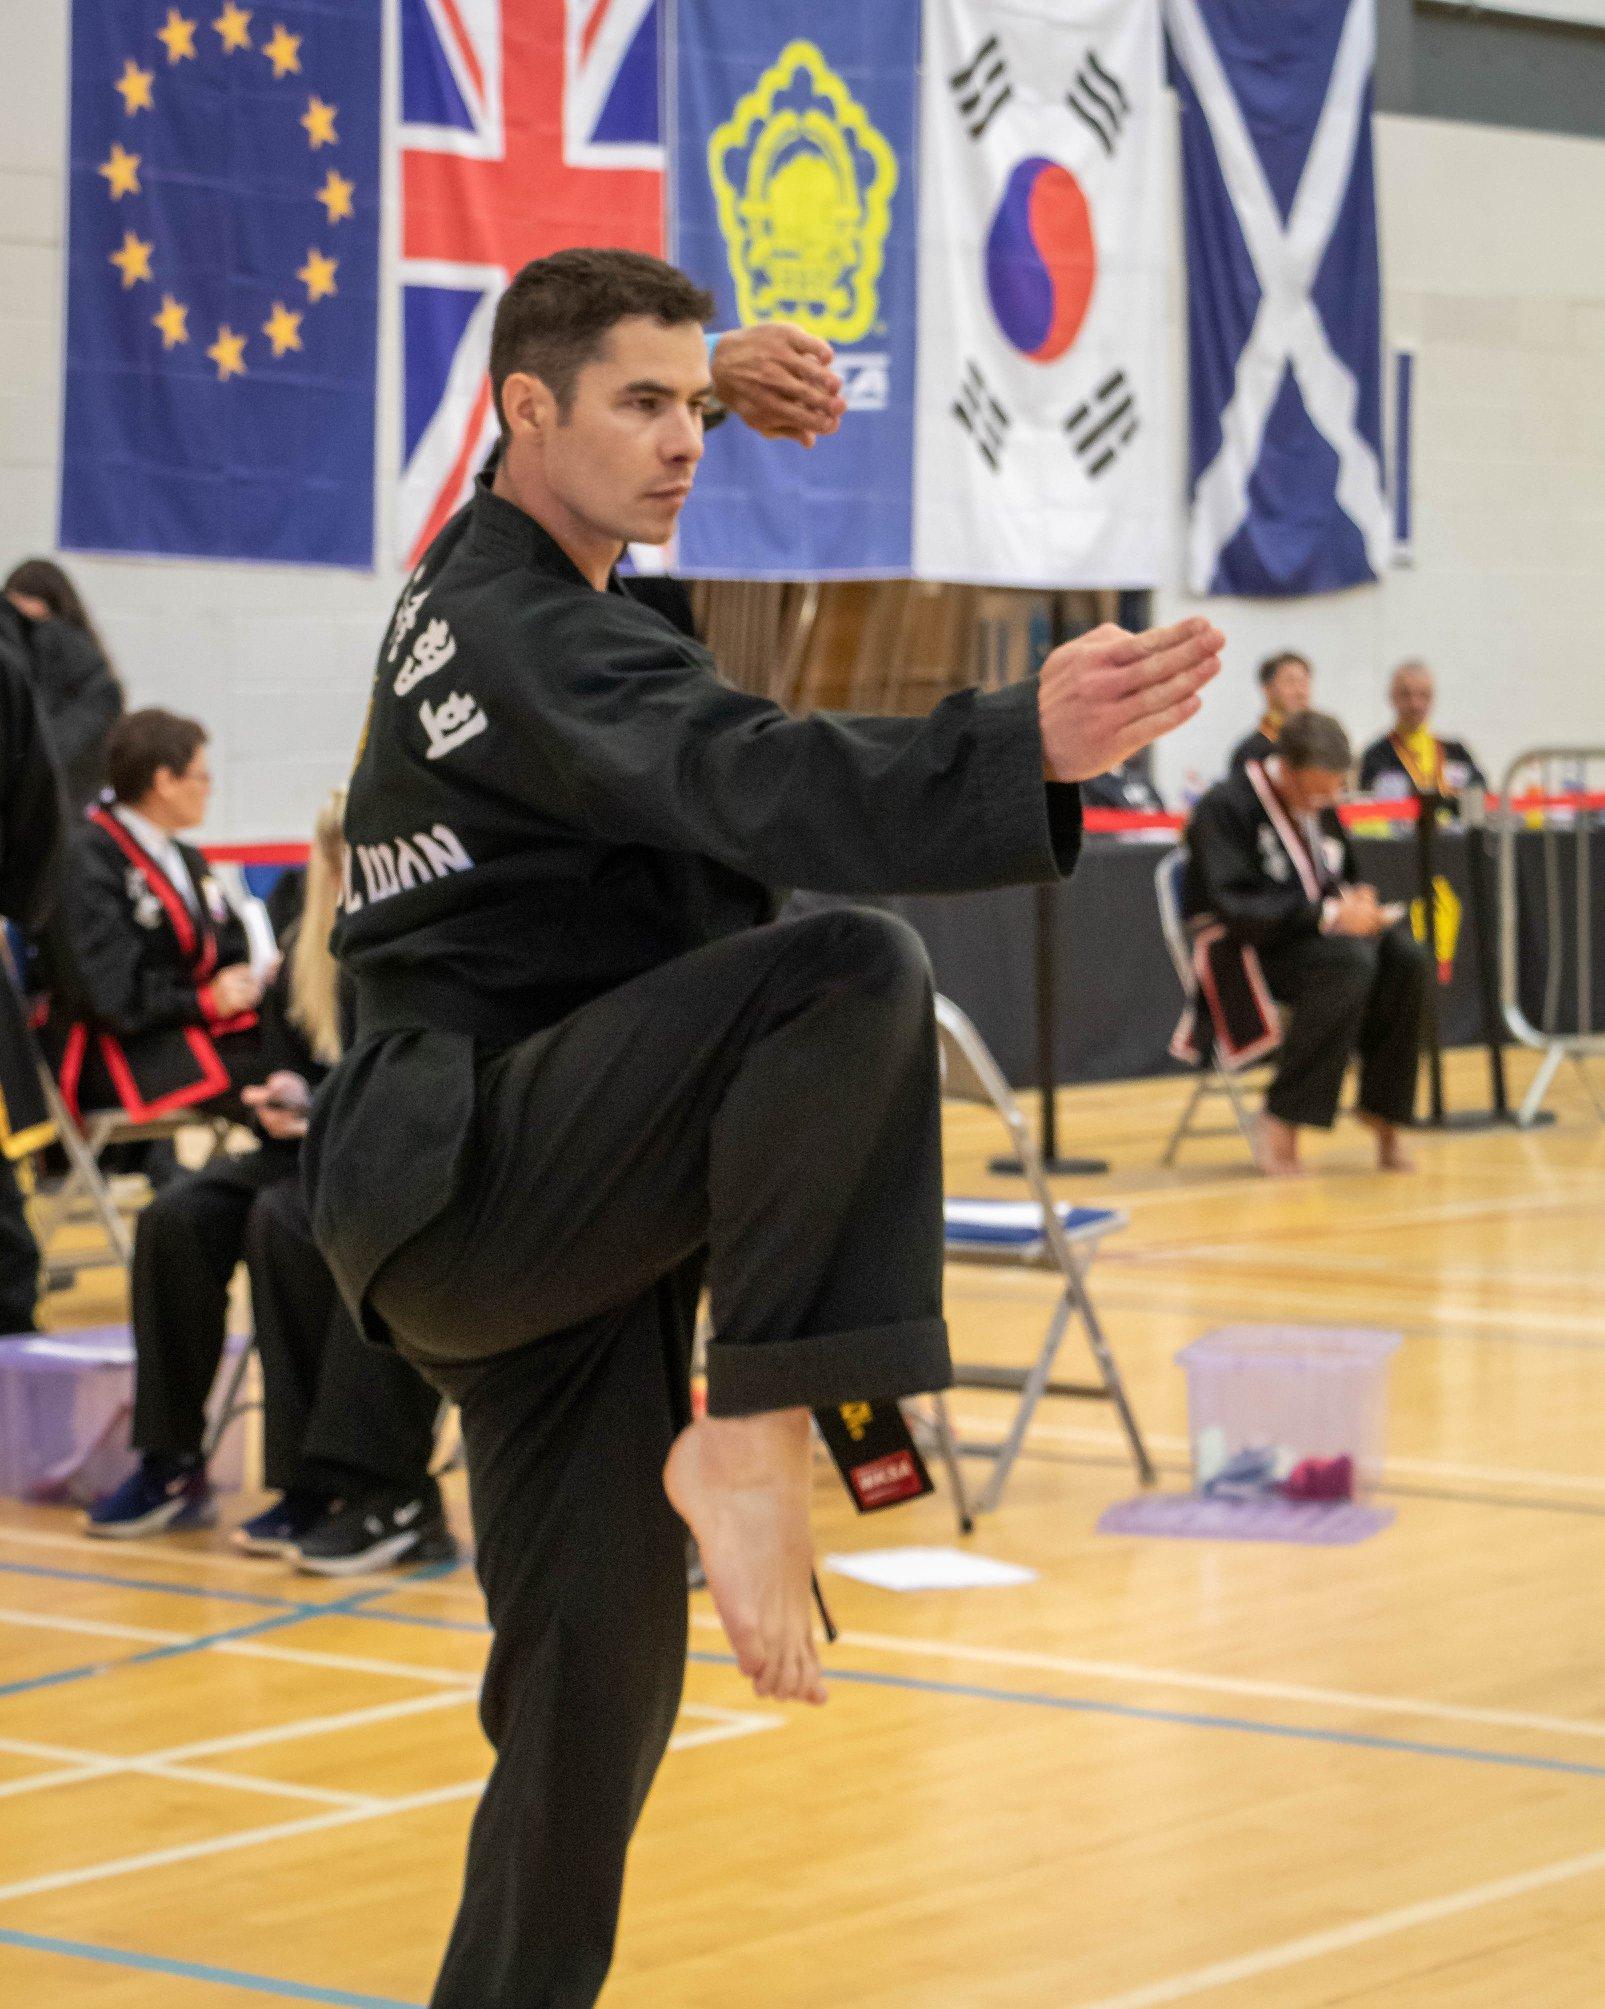 Martial arts Perth Kuk Sool Won Scotland